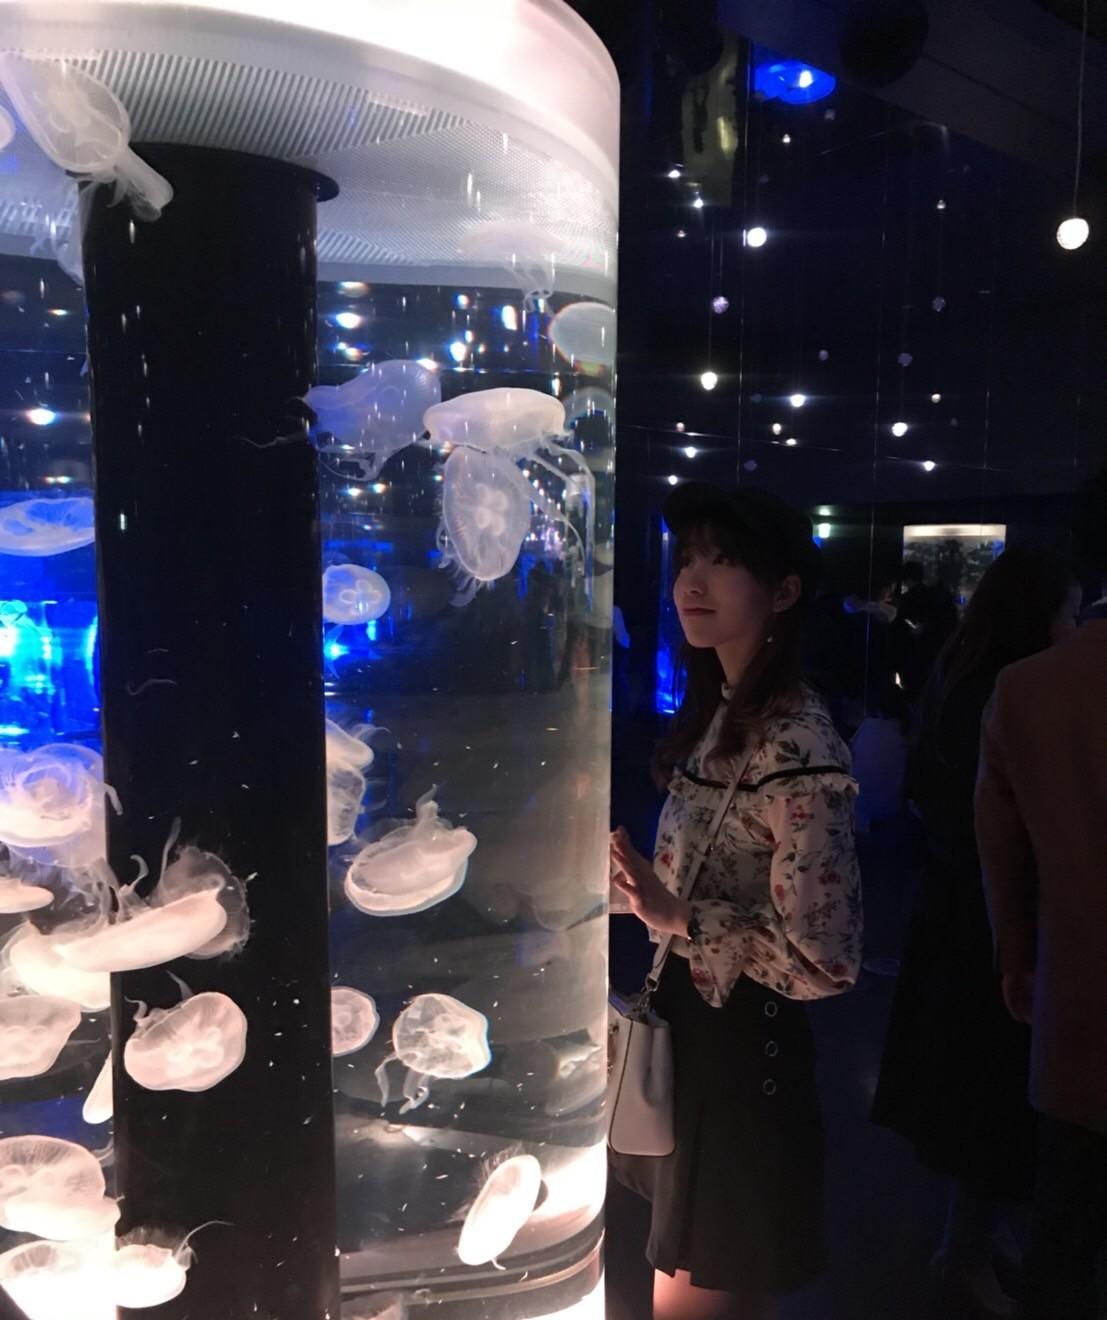 《SNS映え》 品川アクアパーク_1_4